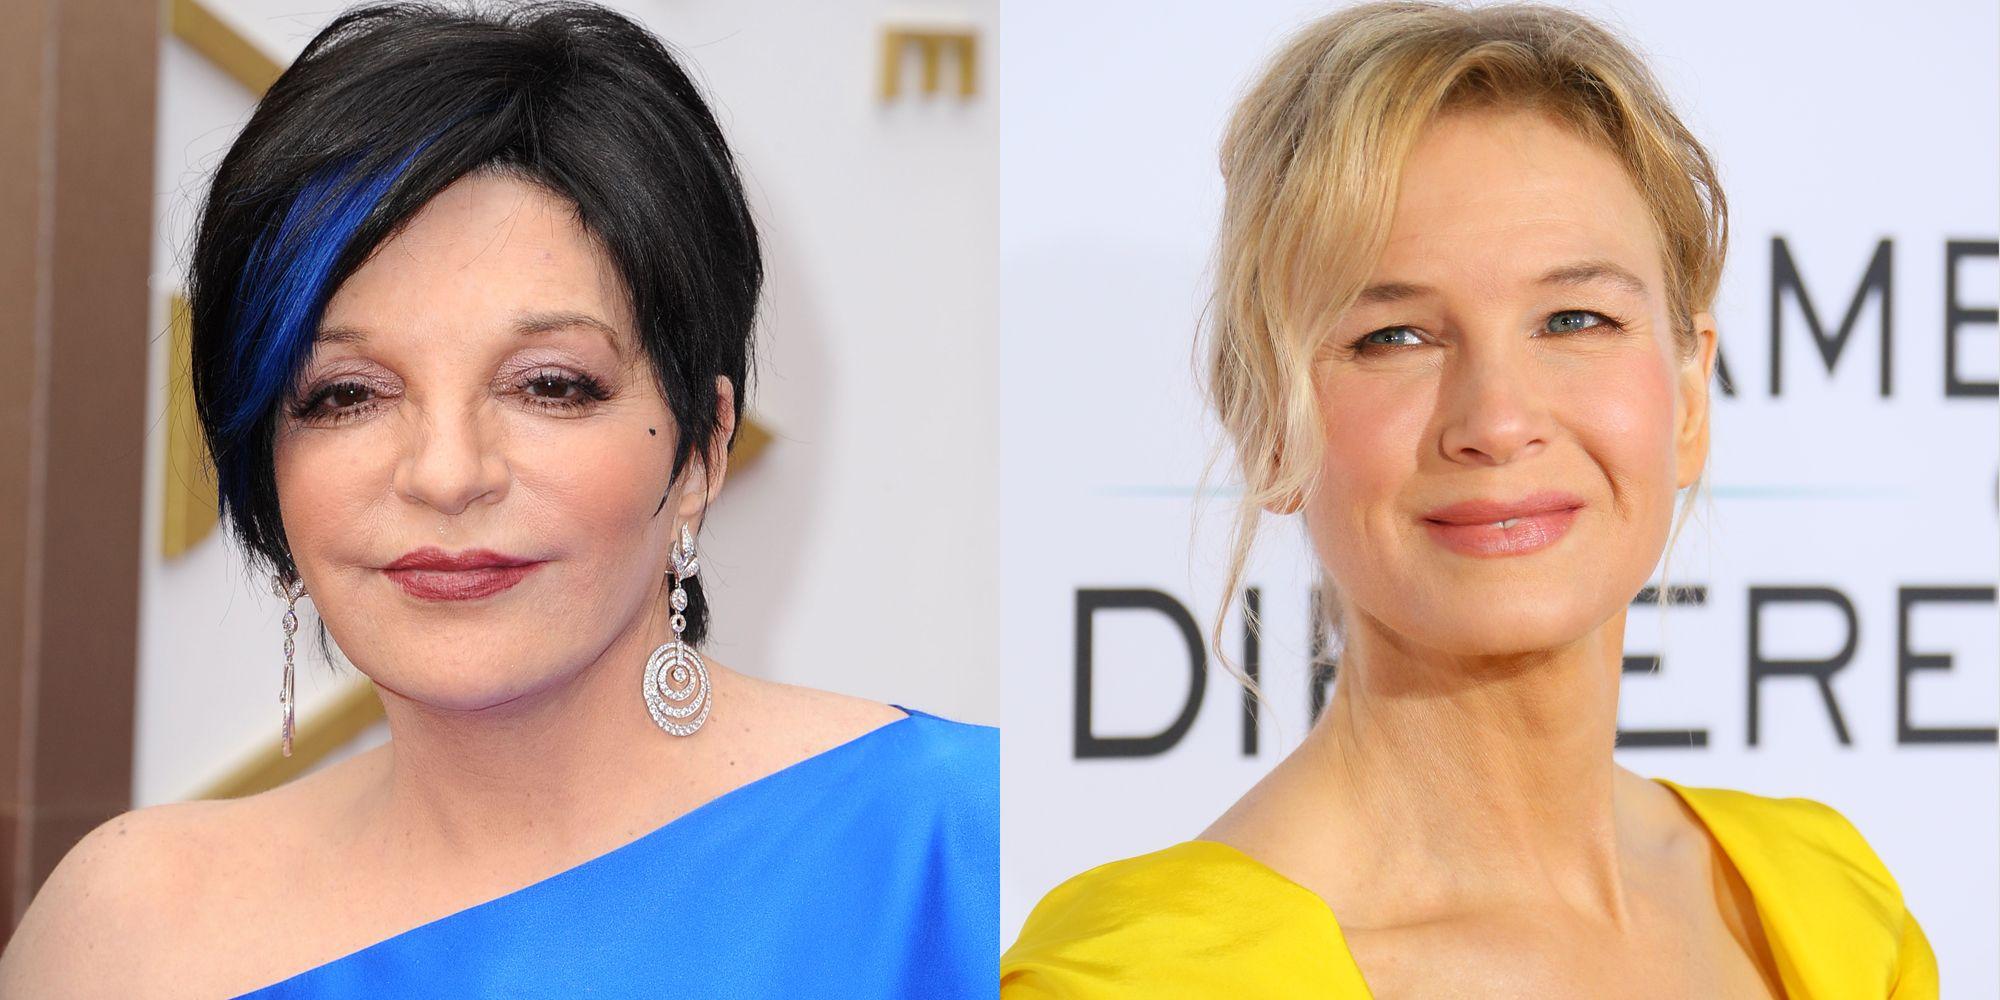 Liza Minnelli Releases Statement Condemning Renee Zellweger Judy Garland Biopic